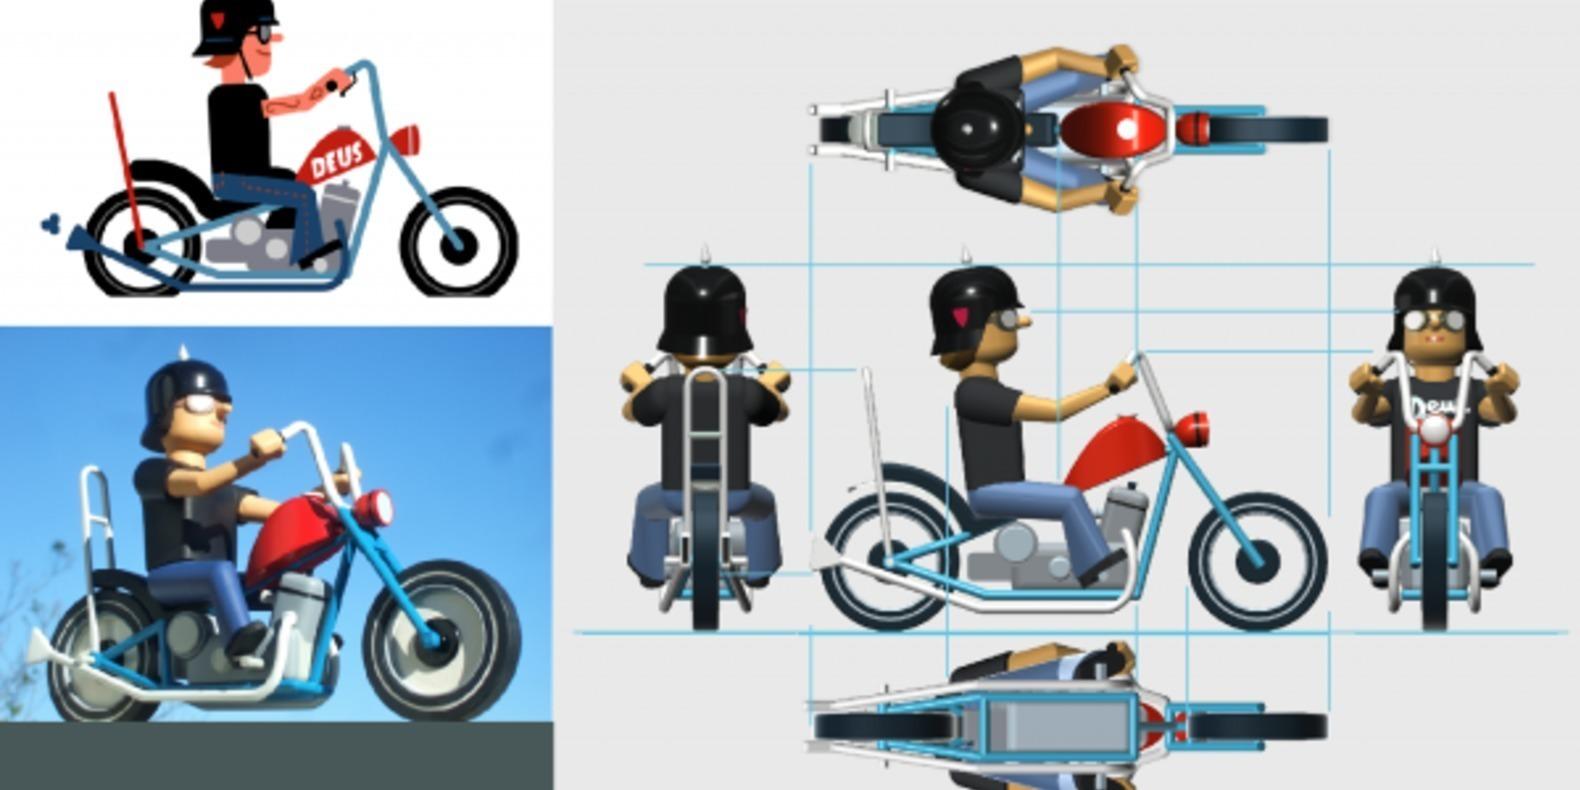 russell tate stay true motorcycle bike biker cults fichier 3D modèle 3D STL 3D printing 6